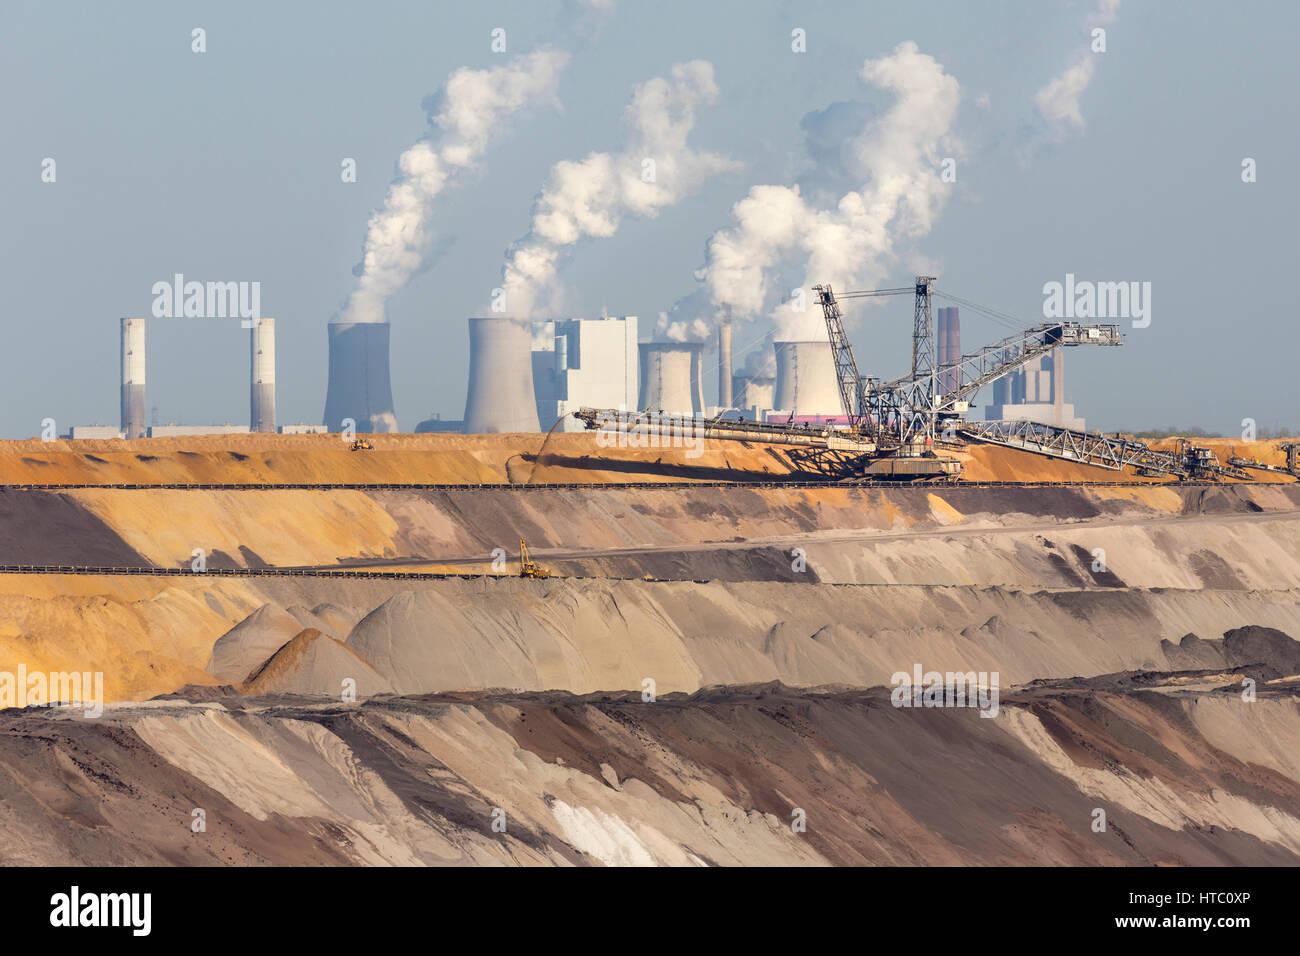 Mina de lignito a cielo abierto, Garzweiler, Renania del Norte-Westfalia, Alemania, Europa Foto de stock